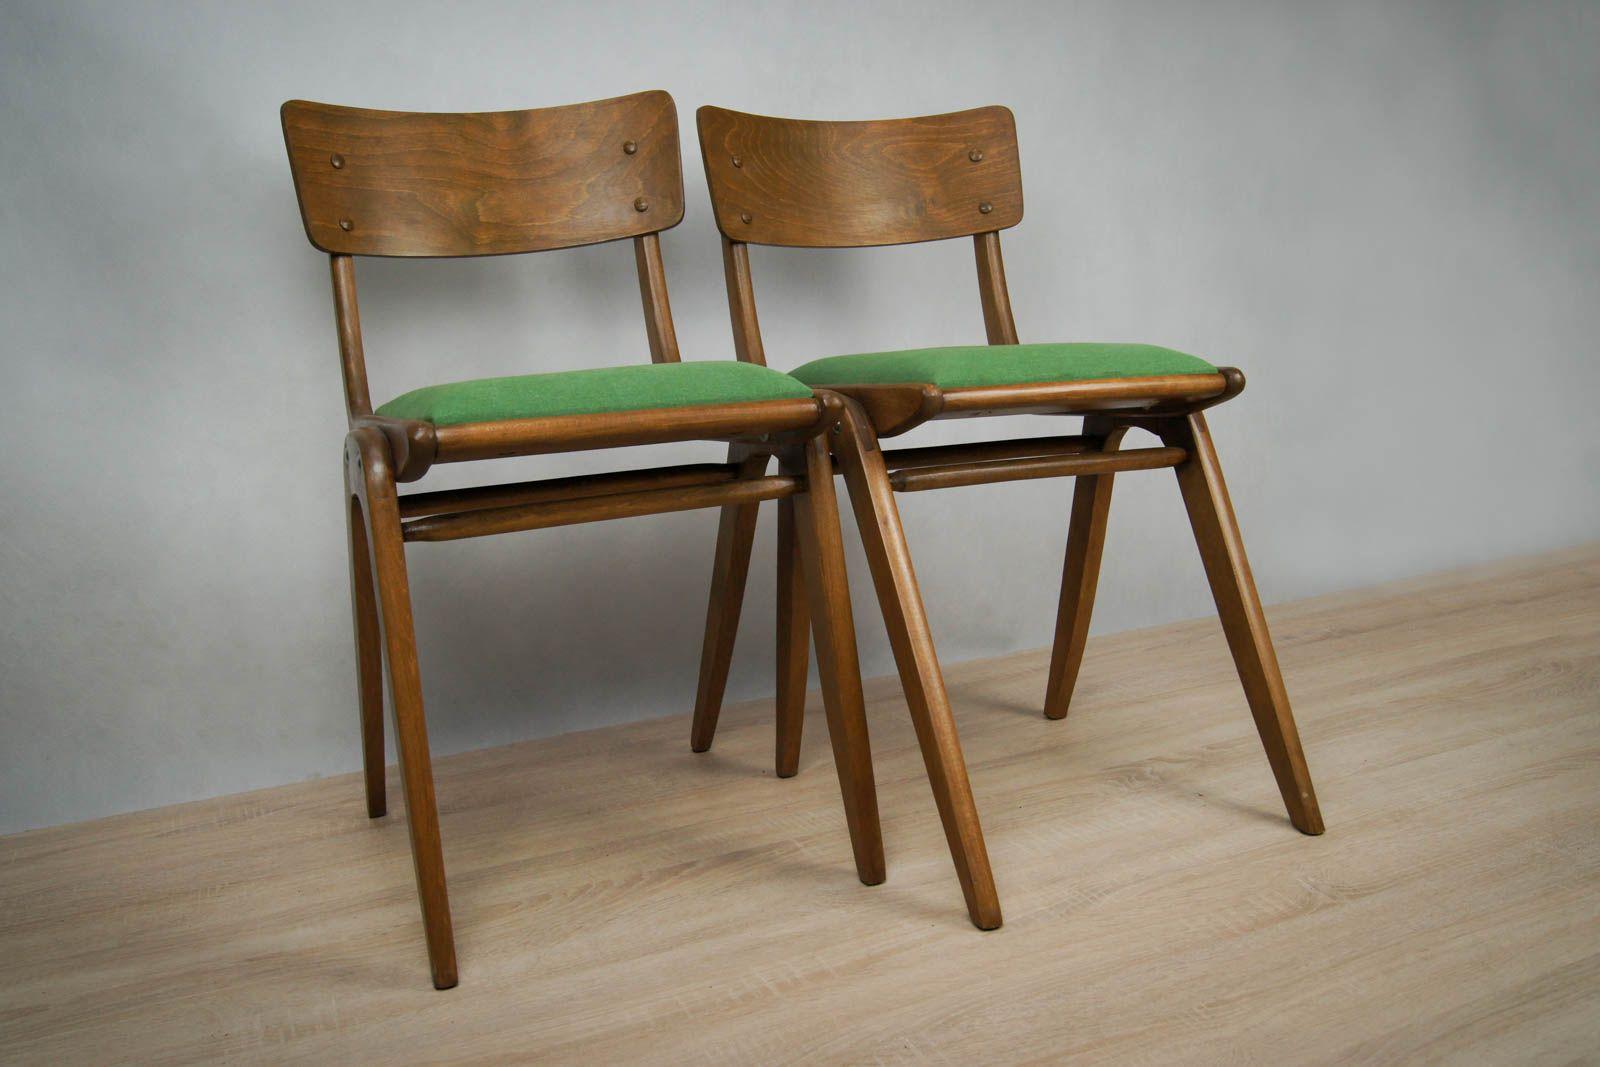 polnische mid century buche st hle mit gr nem bezug 2er. Black Bedroom Furniture Sets. Home Design Ideas